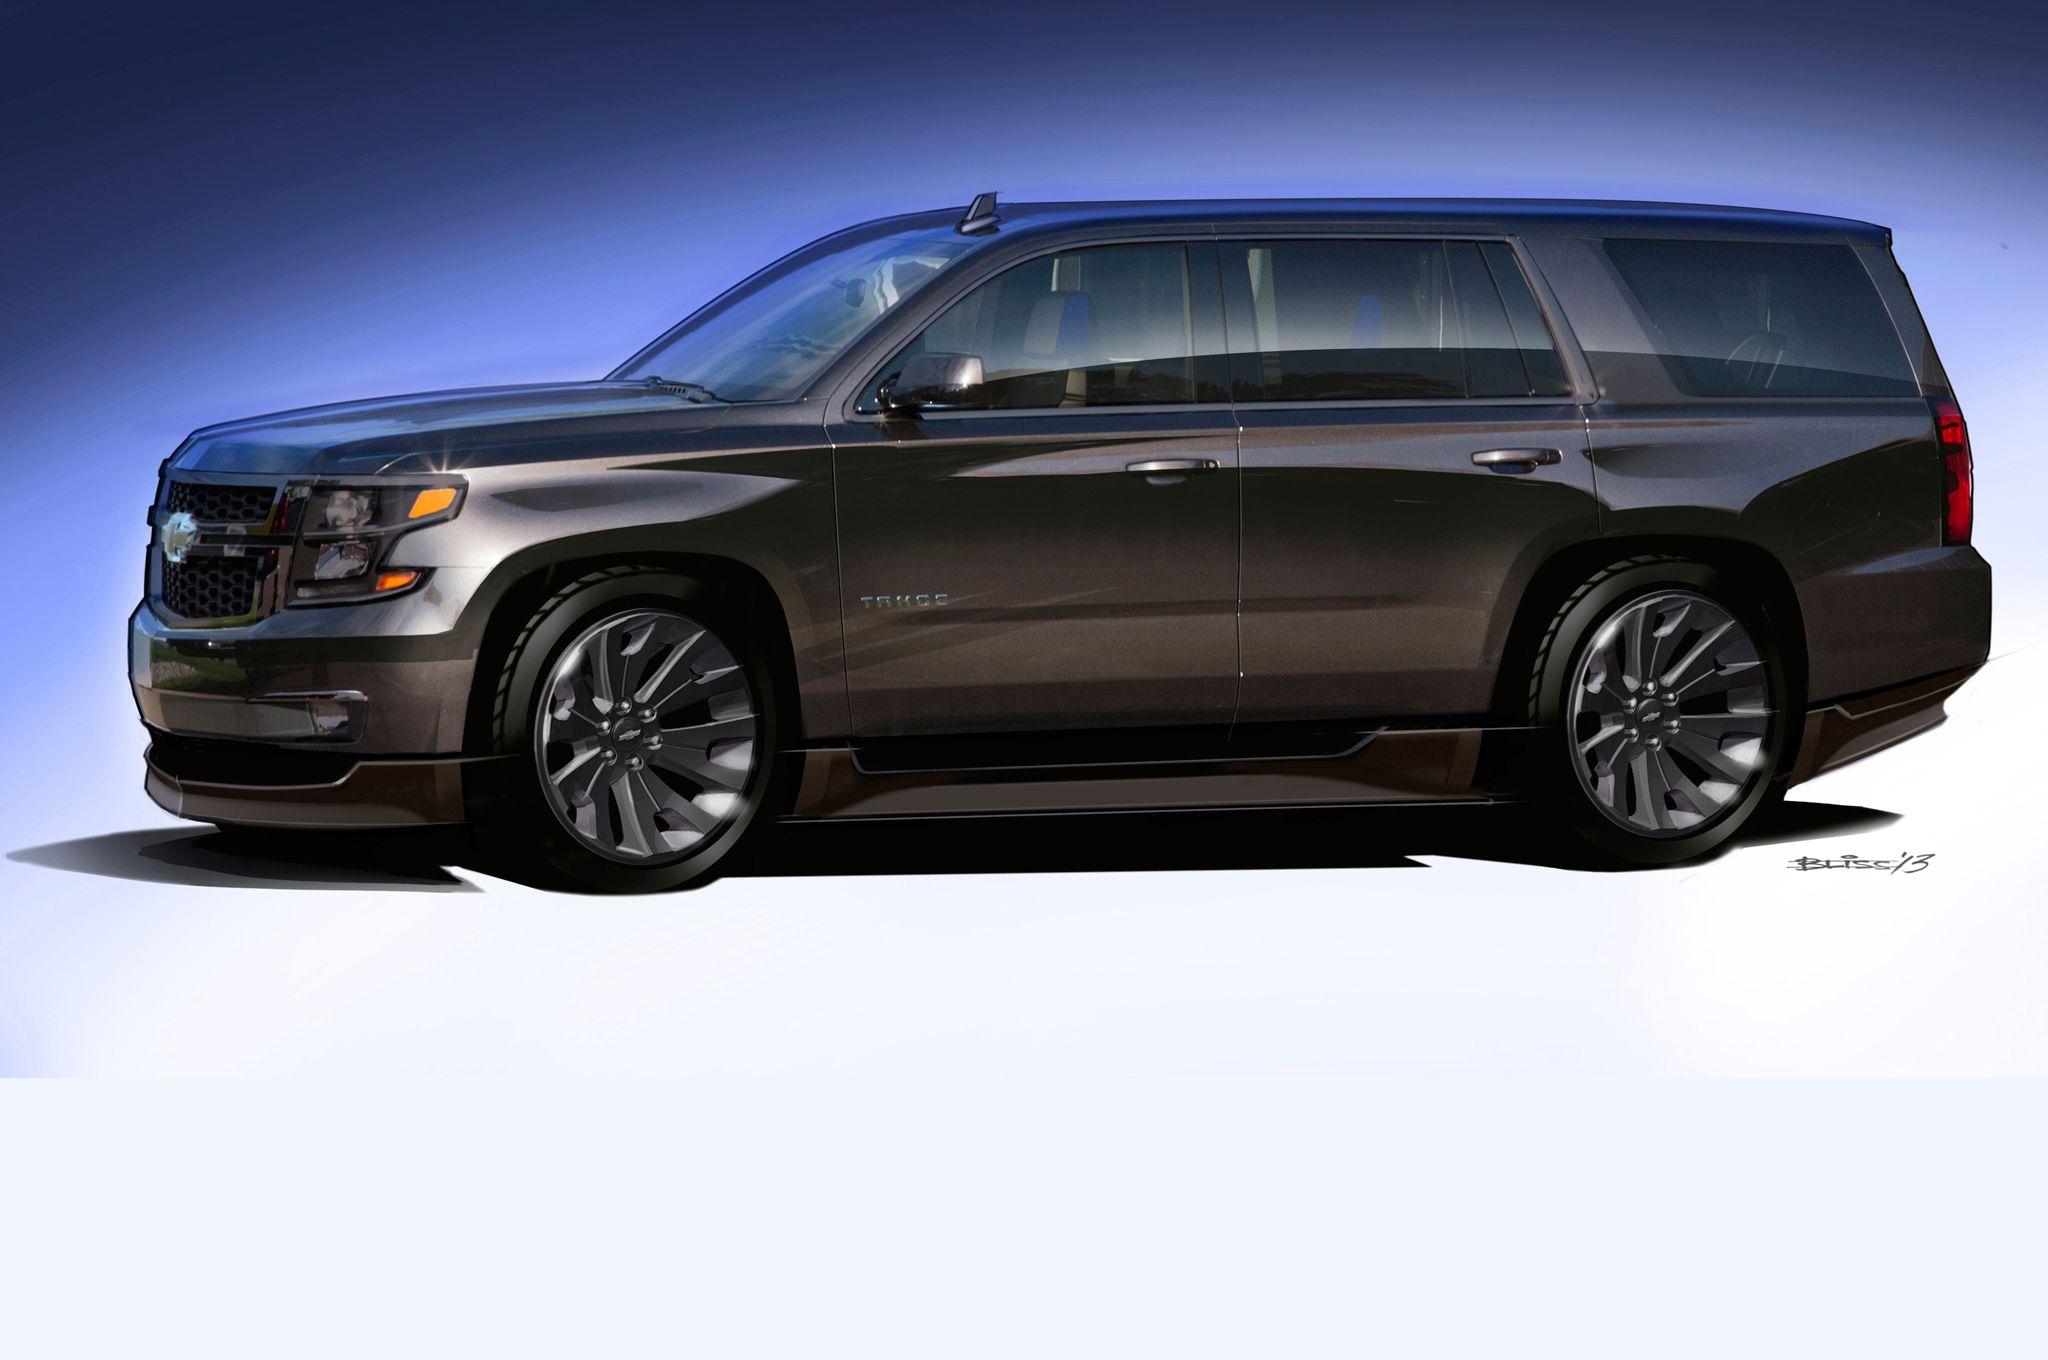 Fast Tough And Fancy Chevrolet Trucks Suvs At 2013 Sema Show Med Bilder